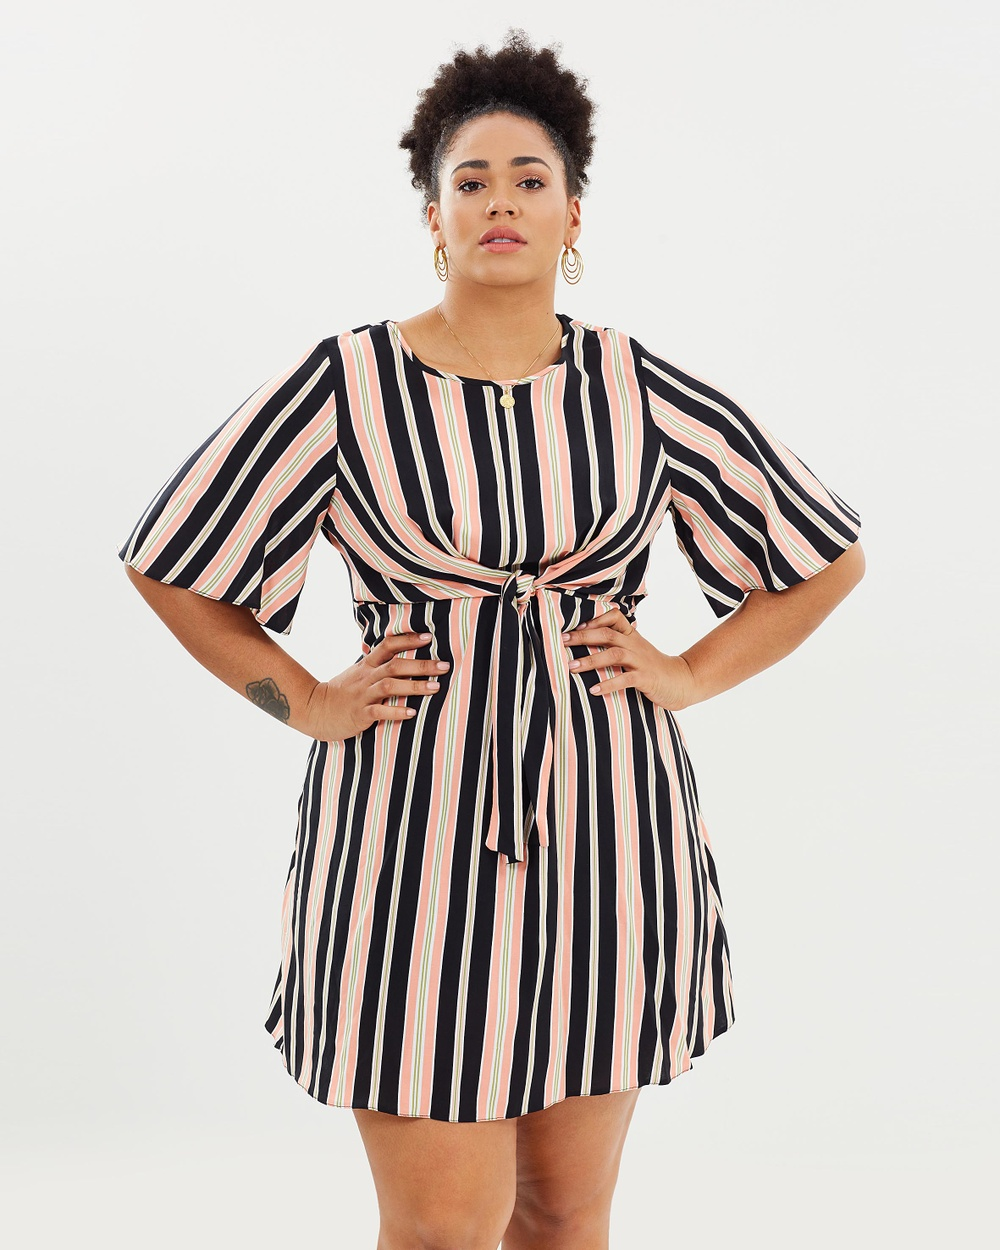 DP Curve Stripe Manipulated Shift Dress Printed Dresses Multi Stripe Manipulated Shift Dress